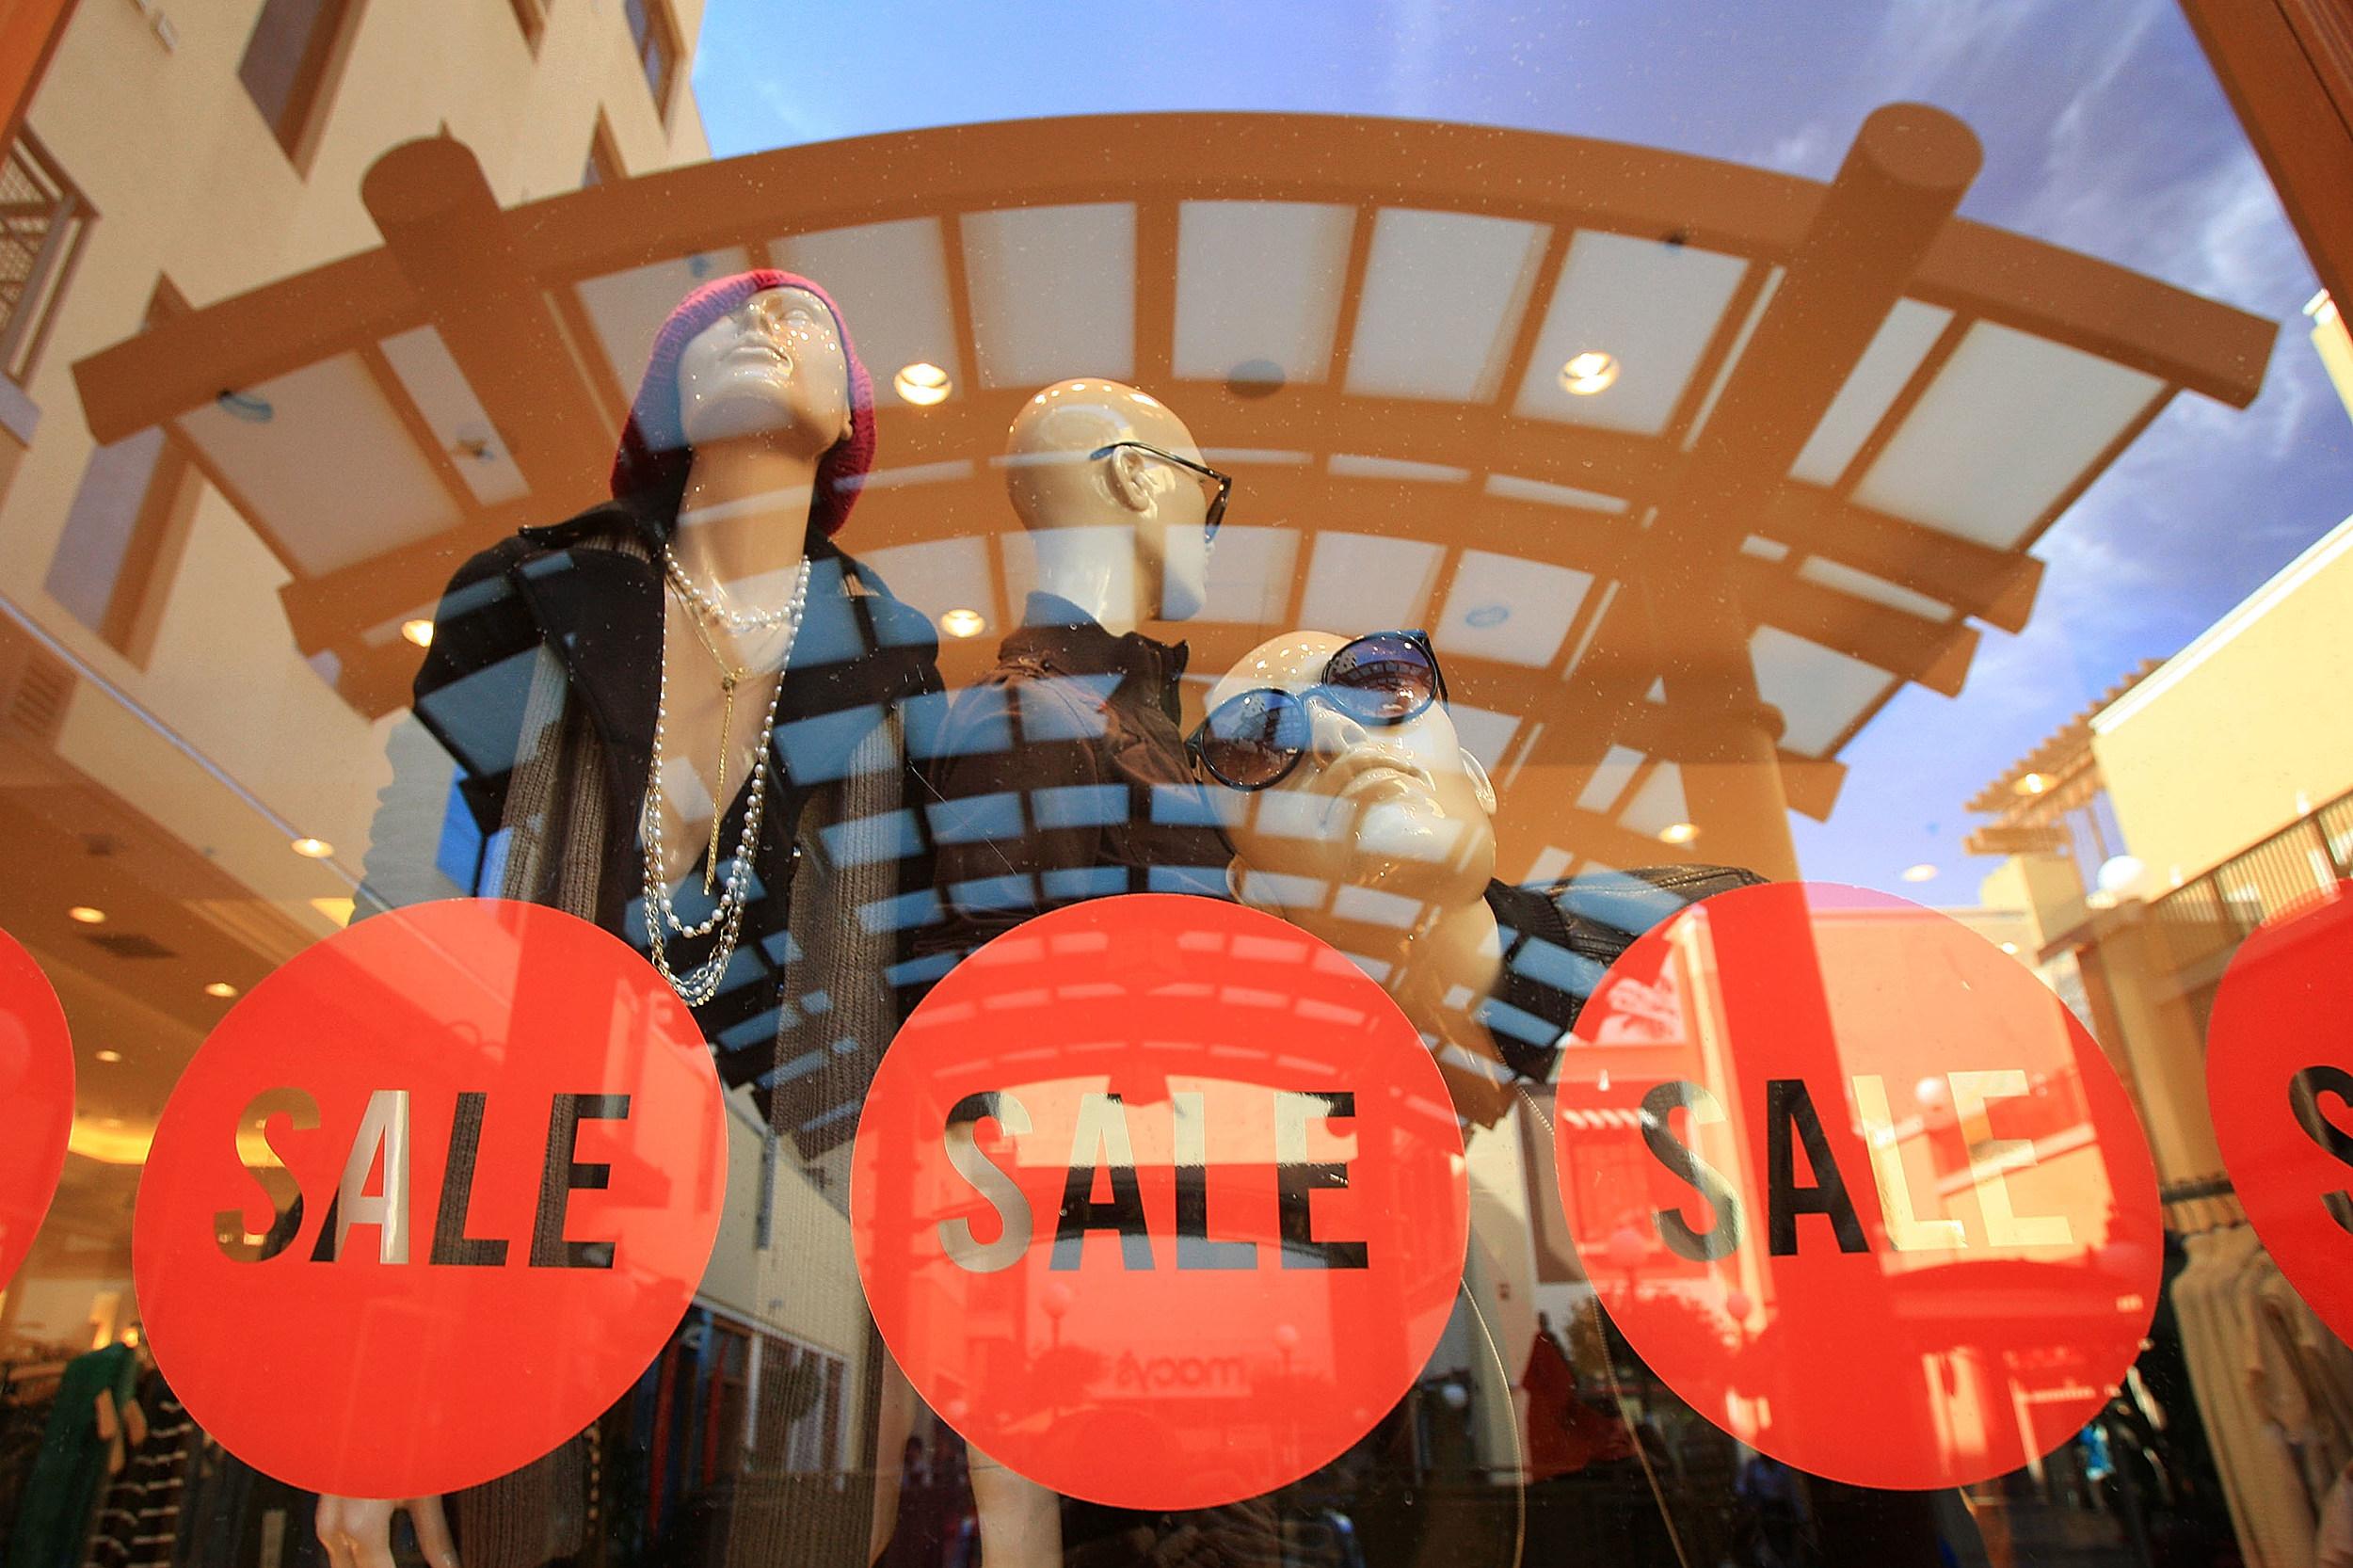 Looking Inside a Store Window in a Mall